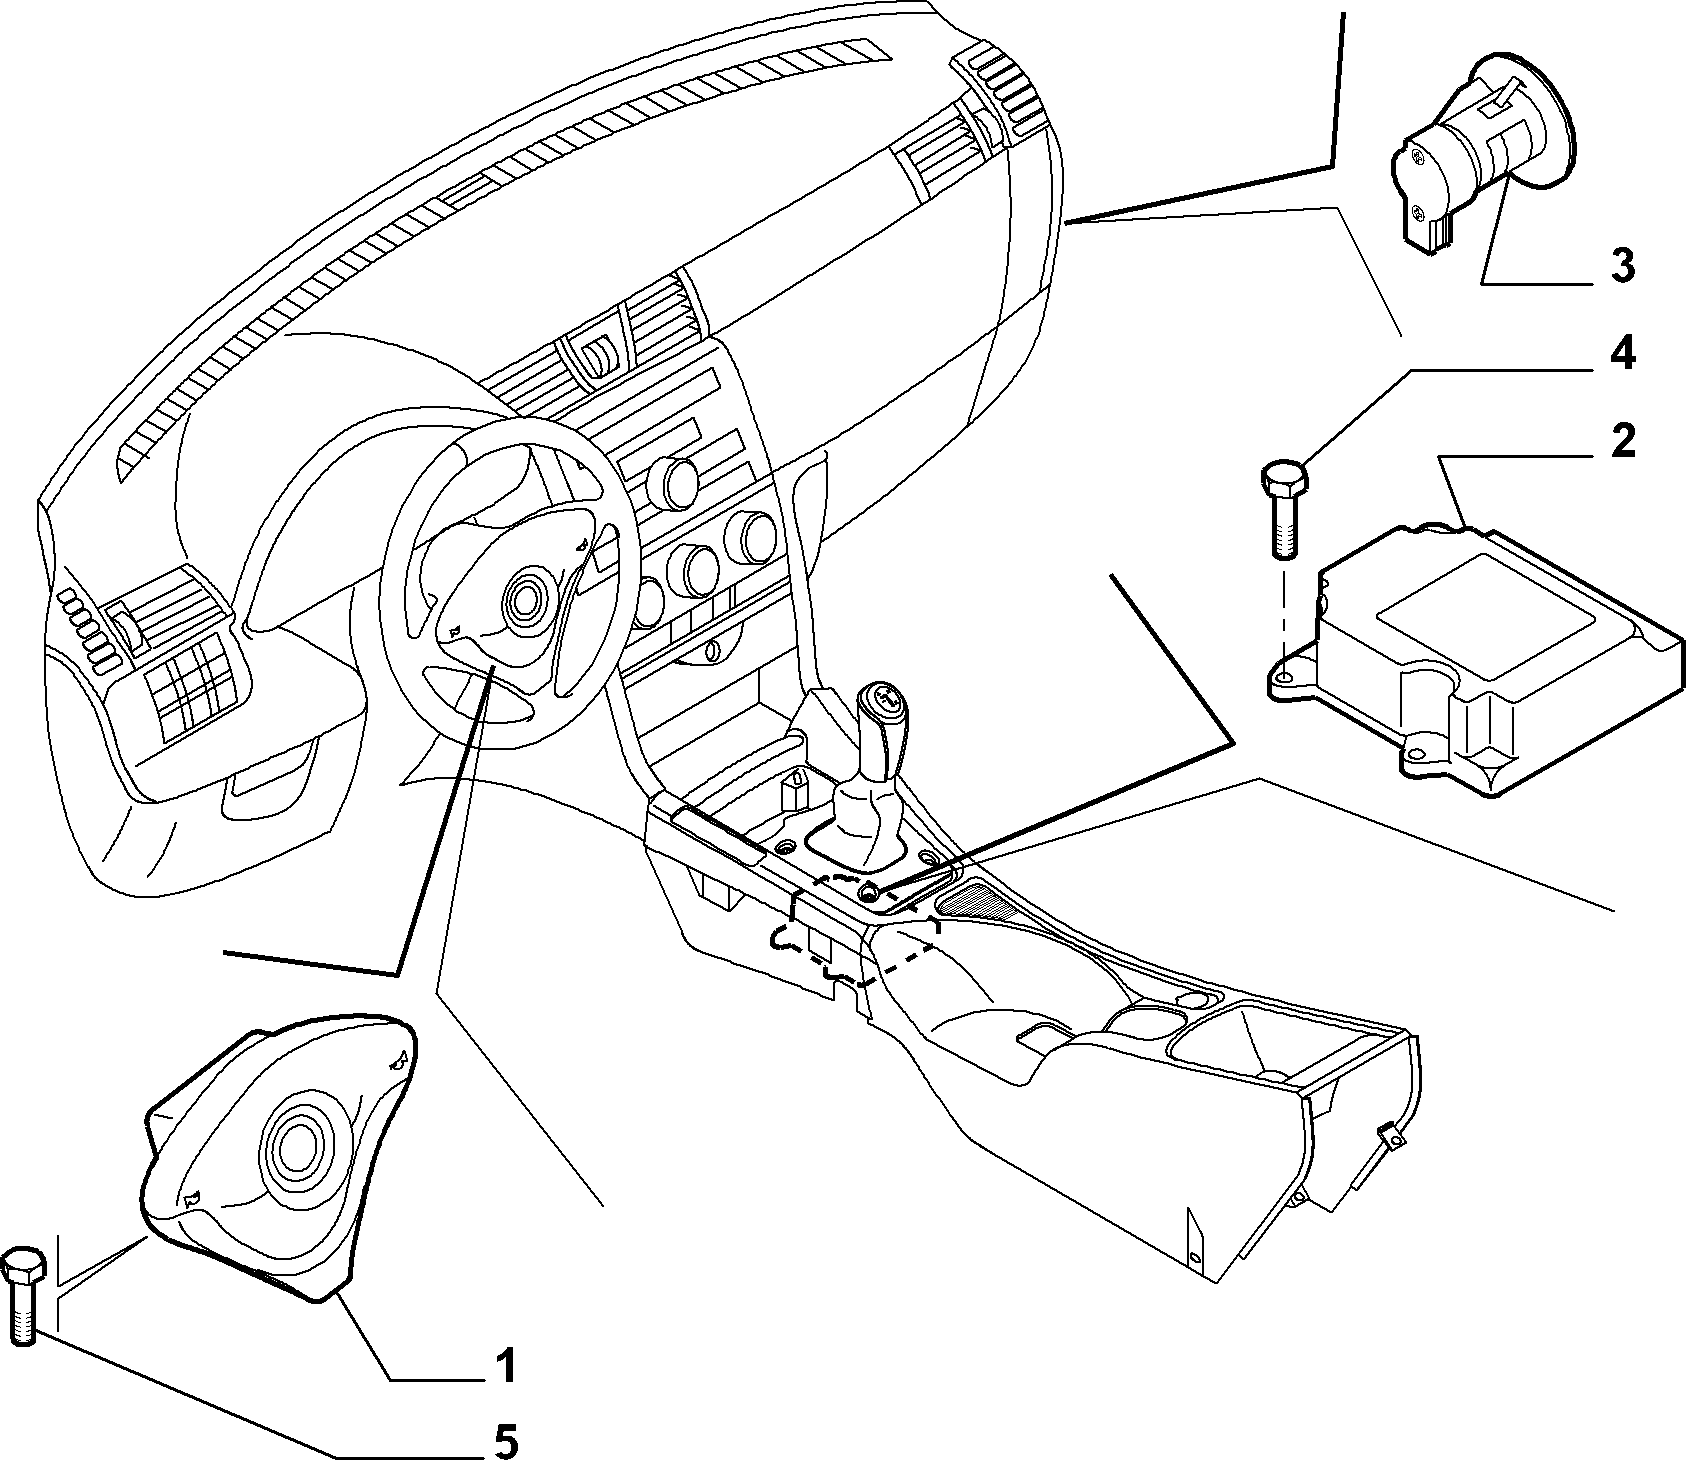 08 подушка безопасности схемы.